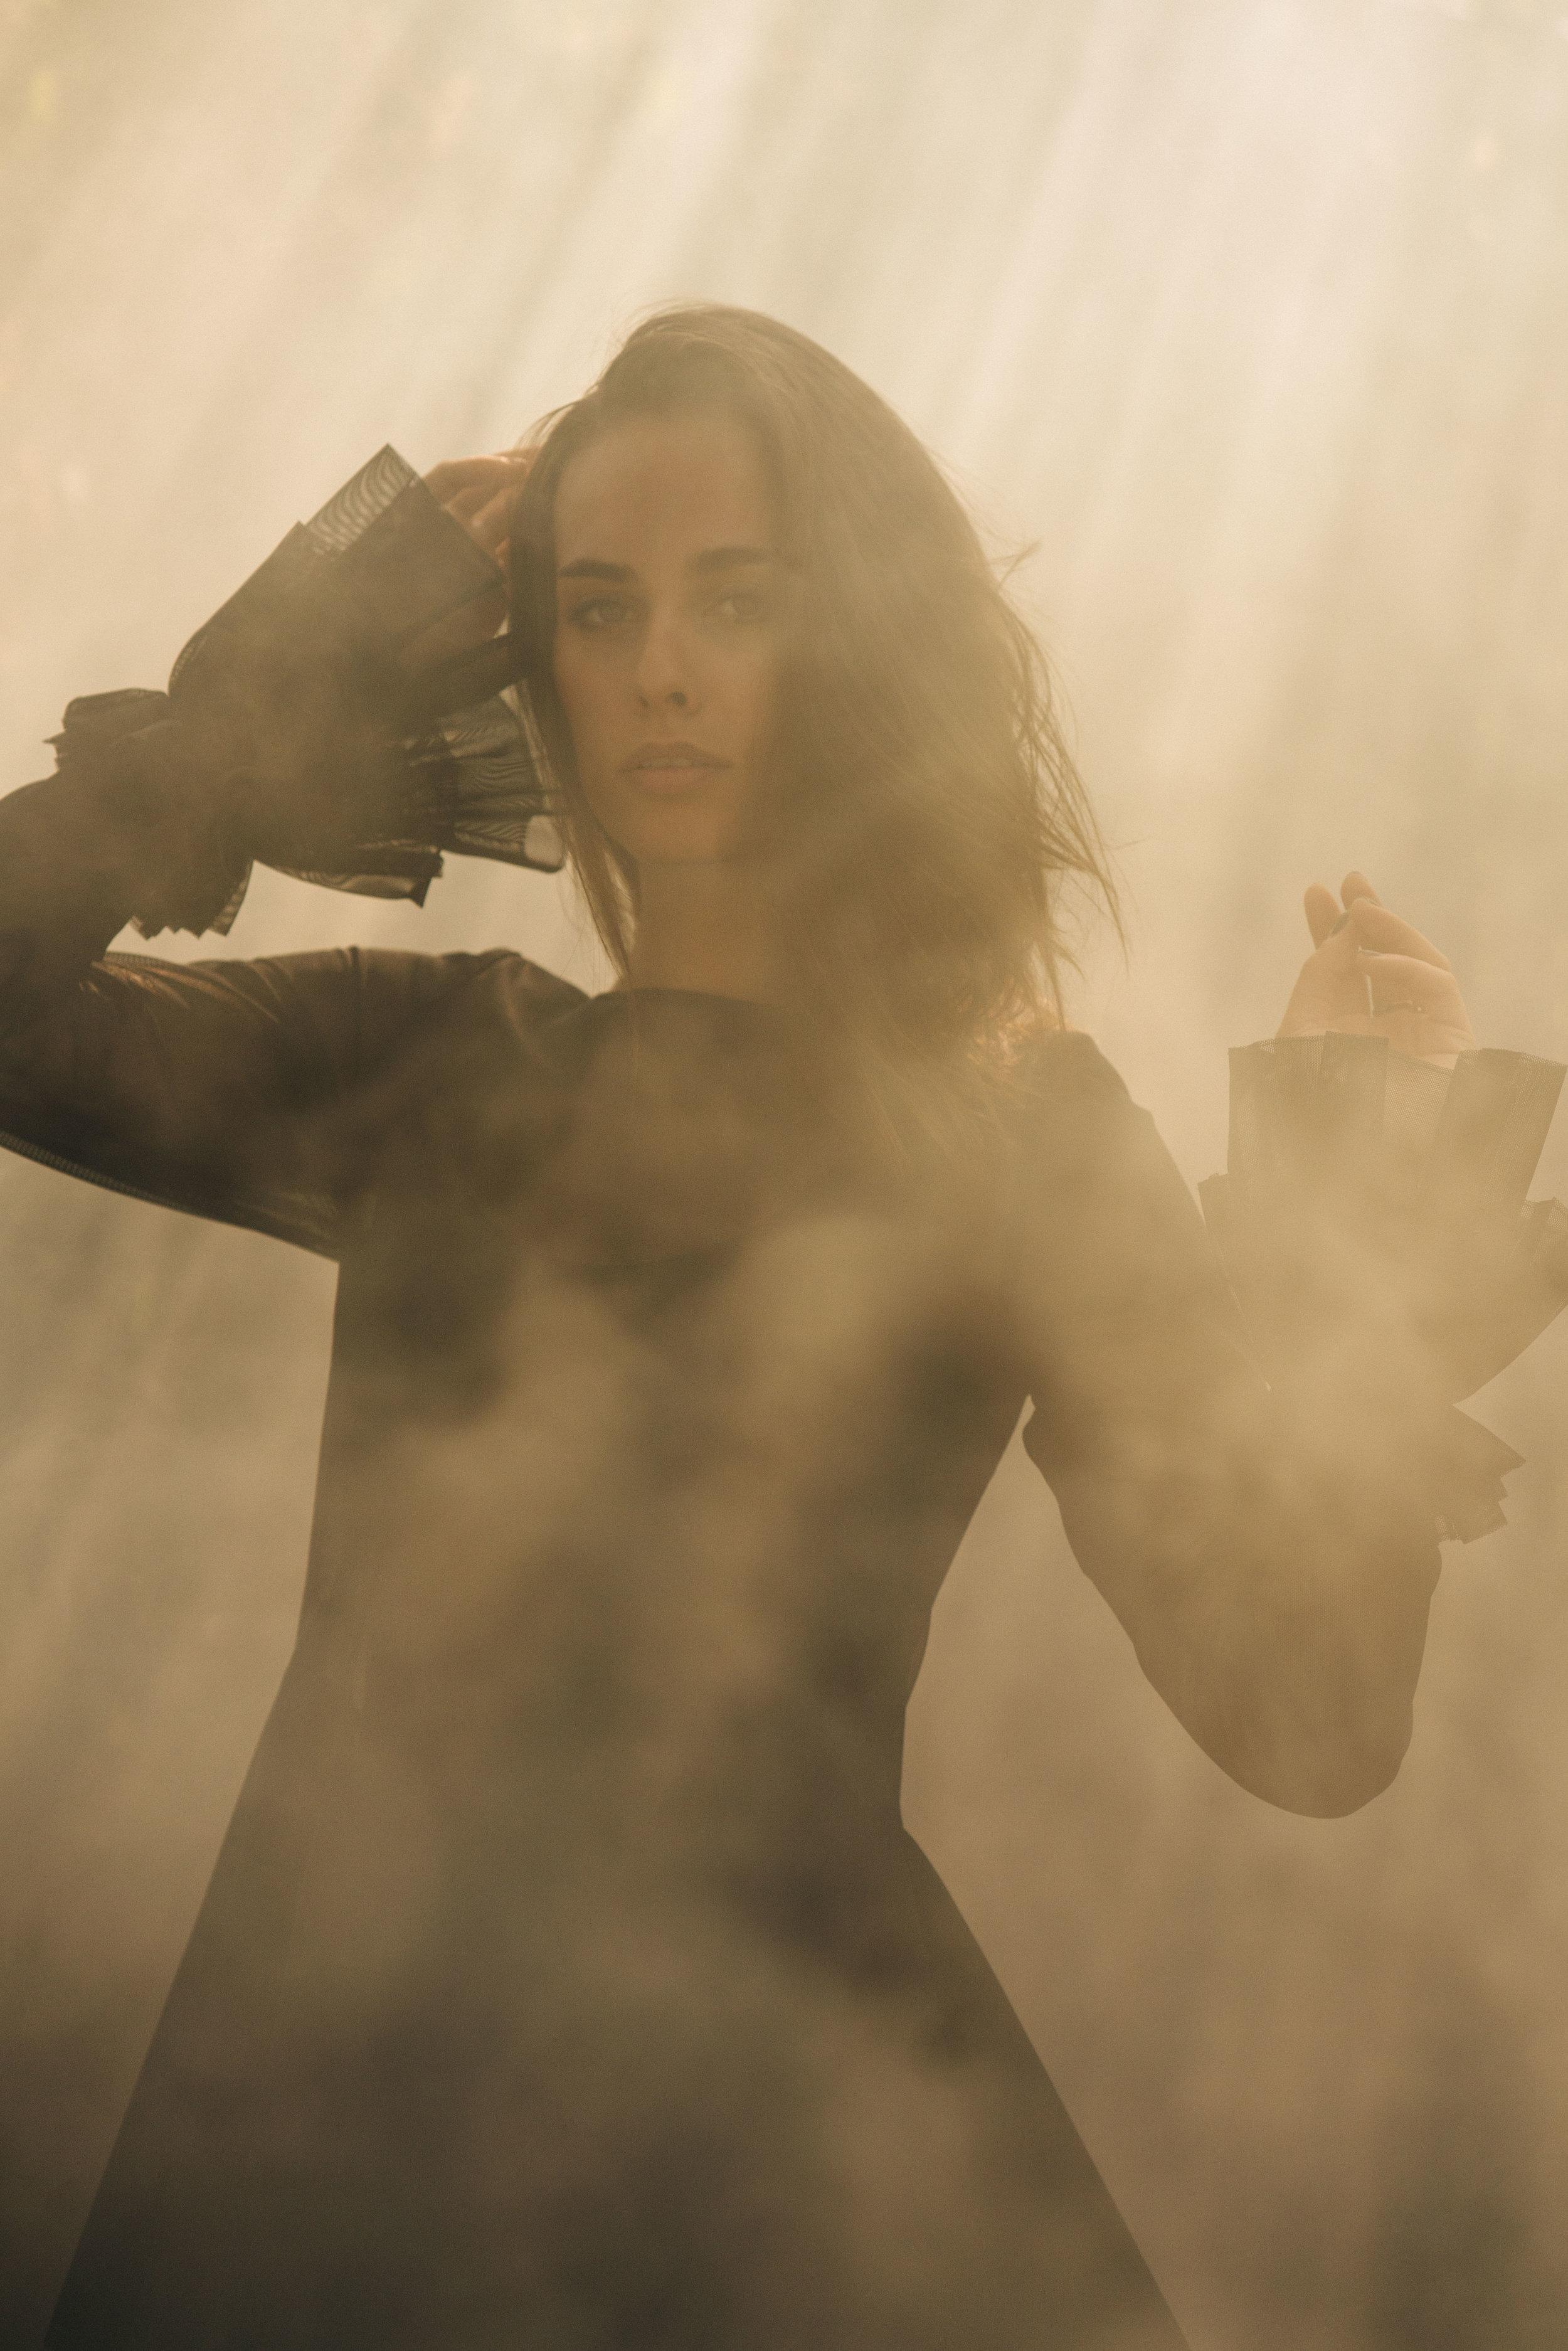 spencer ostrander sophie auster  kelsey randall smoke light outdoor landscape portrait photo black mesh dress sheer ruffle cuff sleeve dress